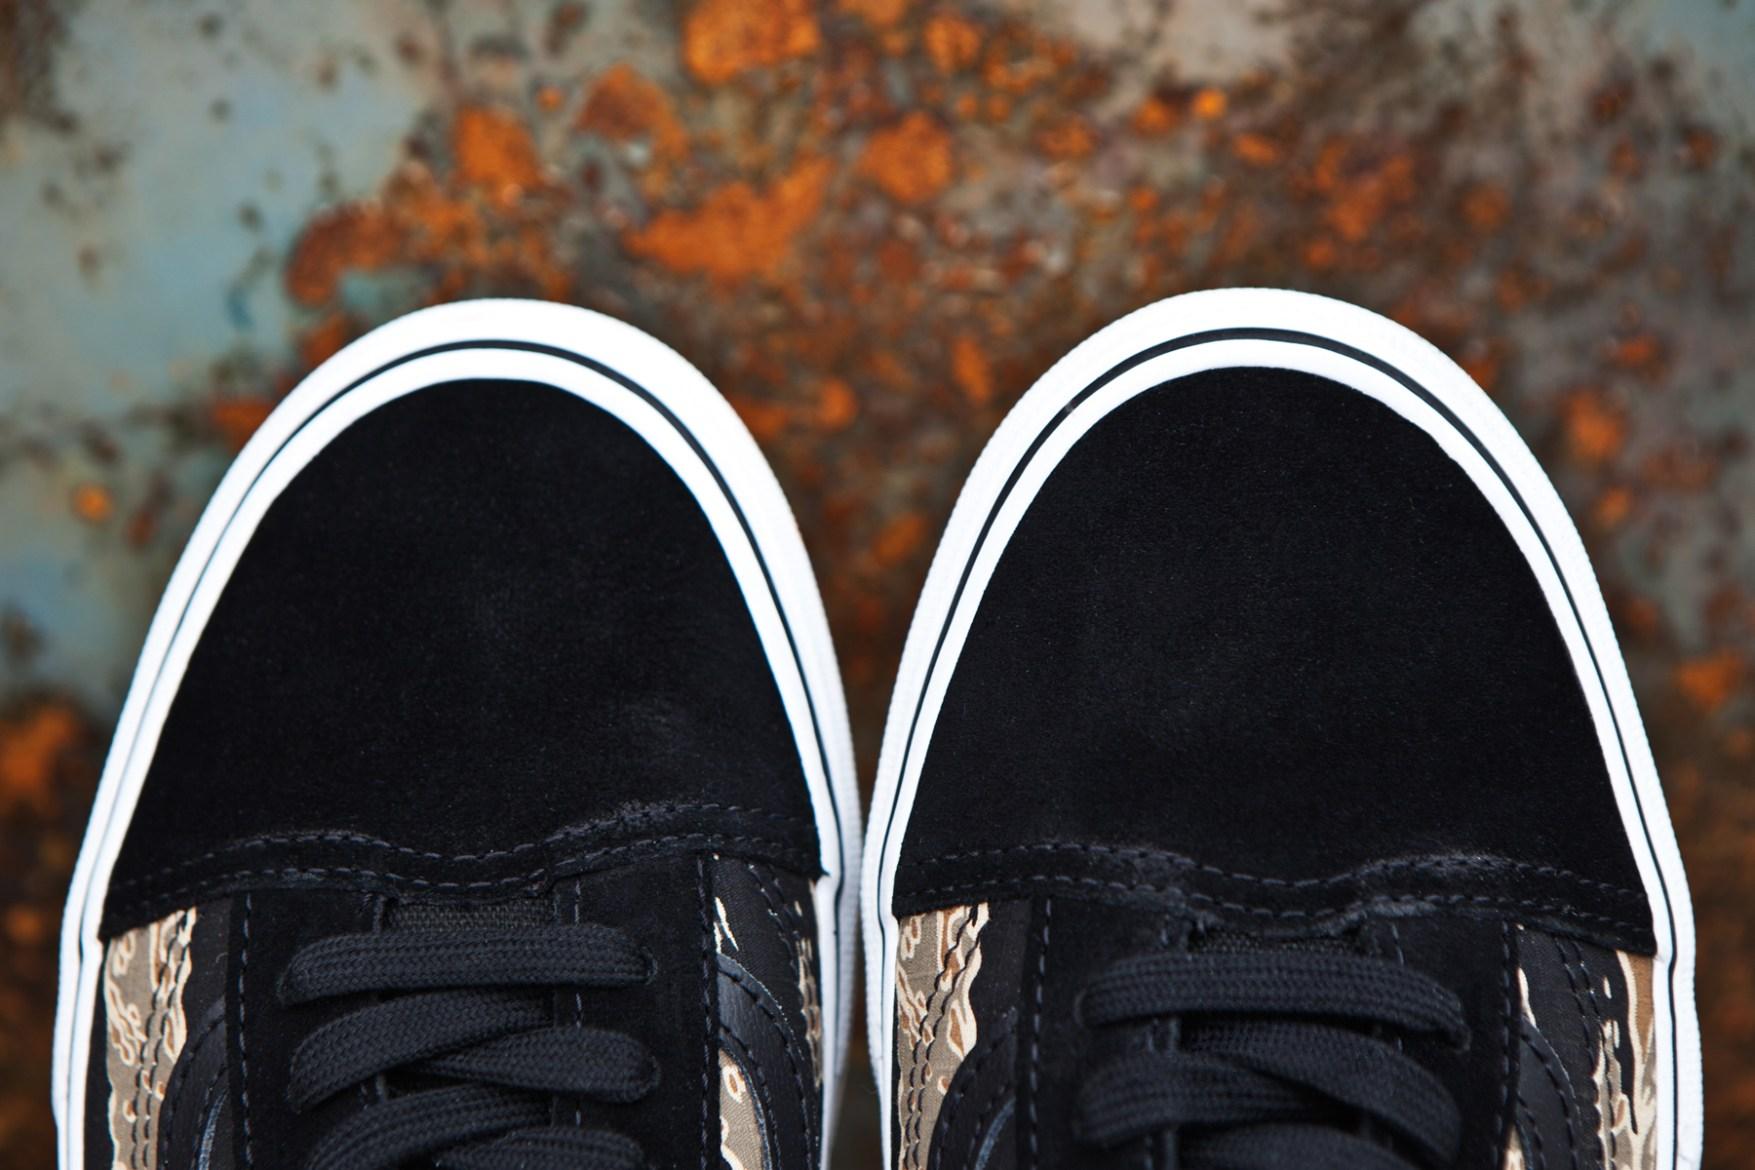 Vans Classics 2014 Spring Old Skool Tiger Camo/Black